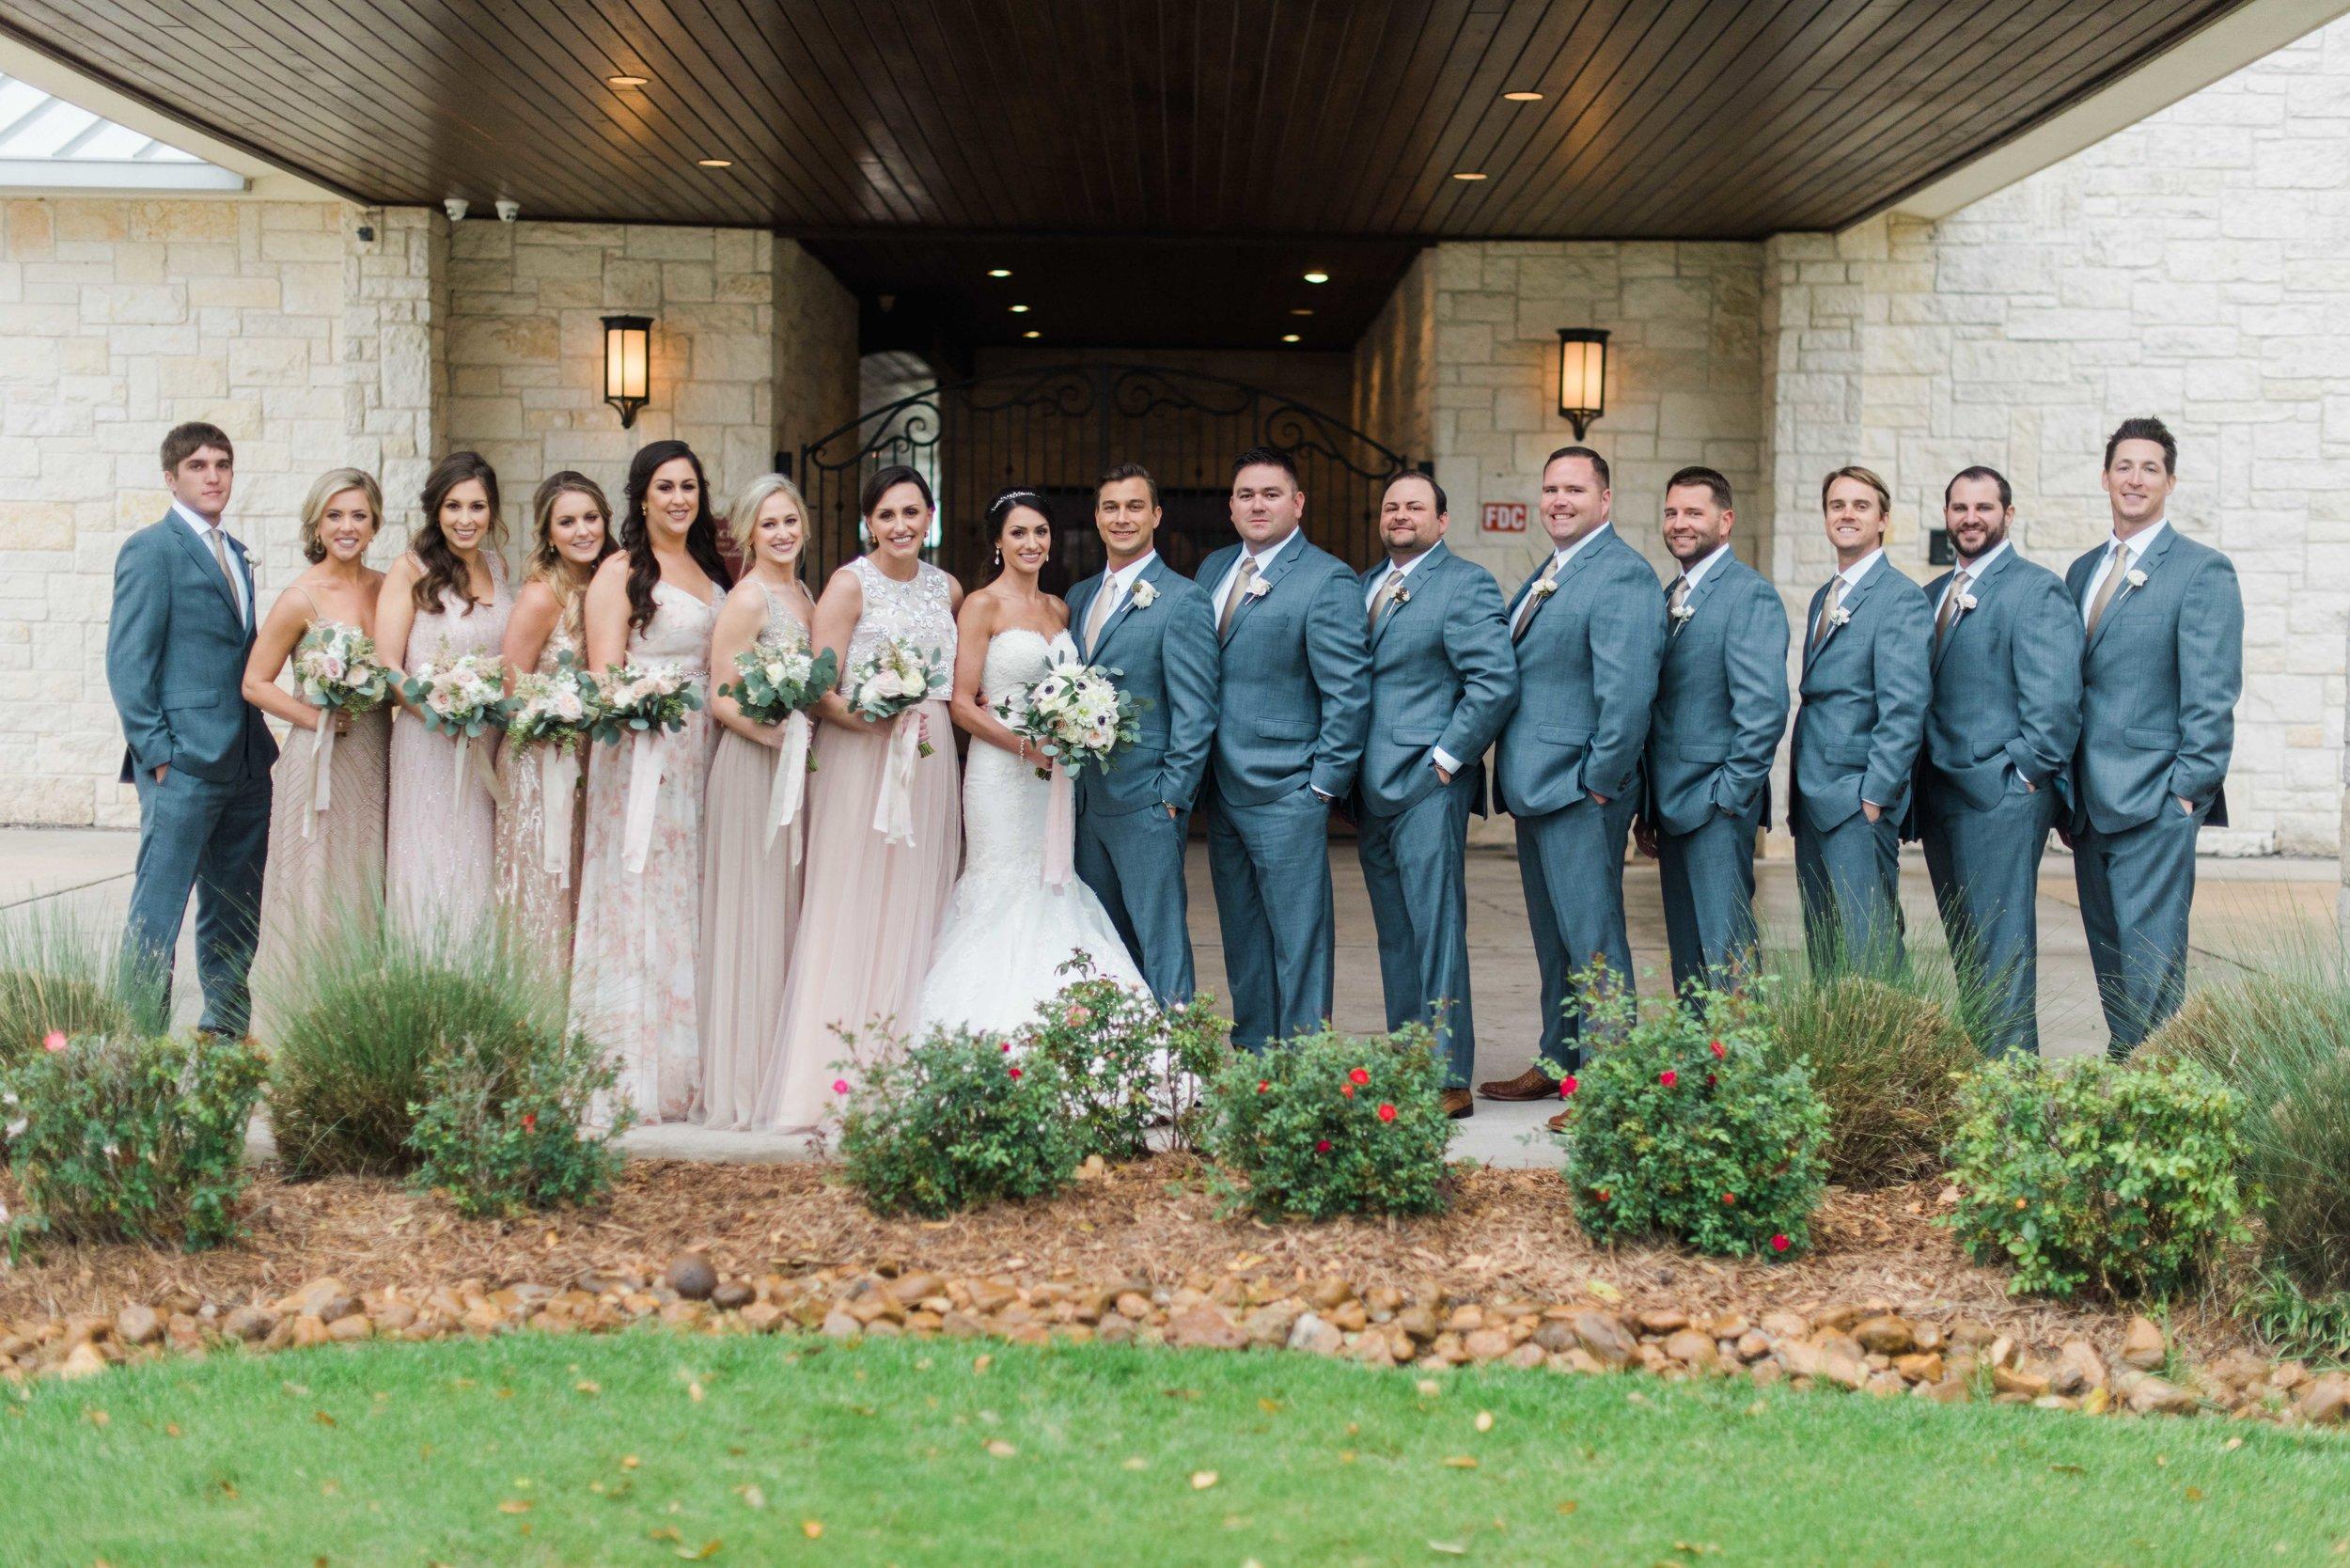 Briscoe-Manor-Houston-Wedding-Photographer-Modern-Luxury-Weddings-Dana-Fernandez-Photograpy-Fine-Art-Photographer-Houston-Film-Destination-PNW-Wedding-Photographer-7.jpg